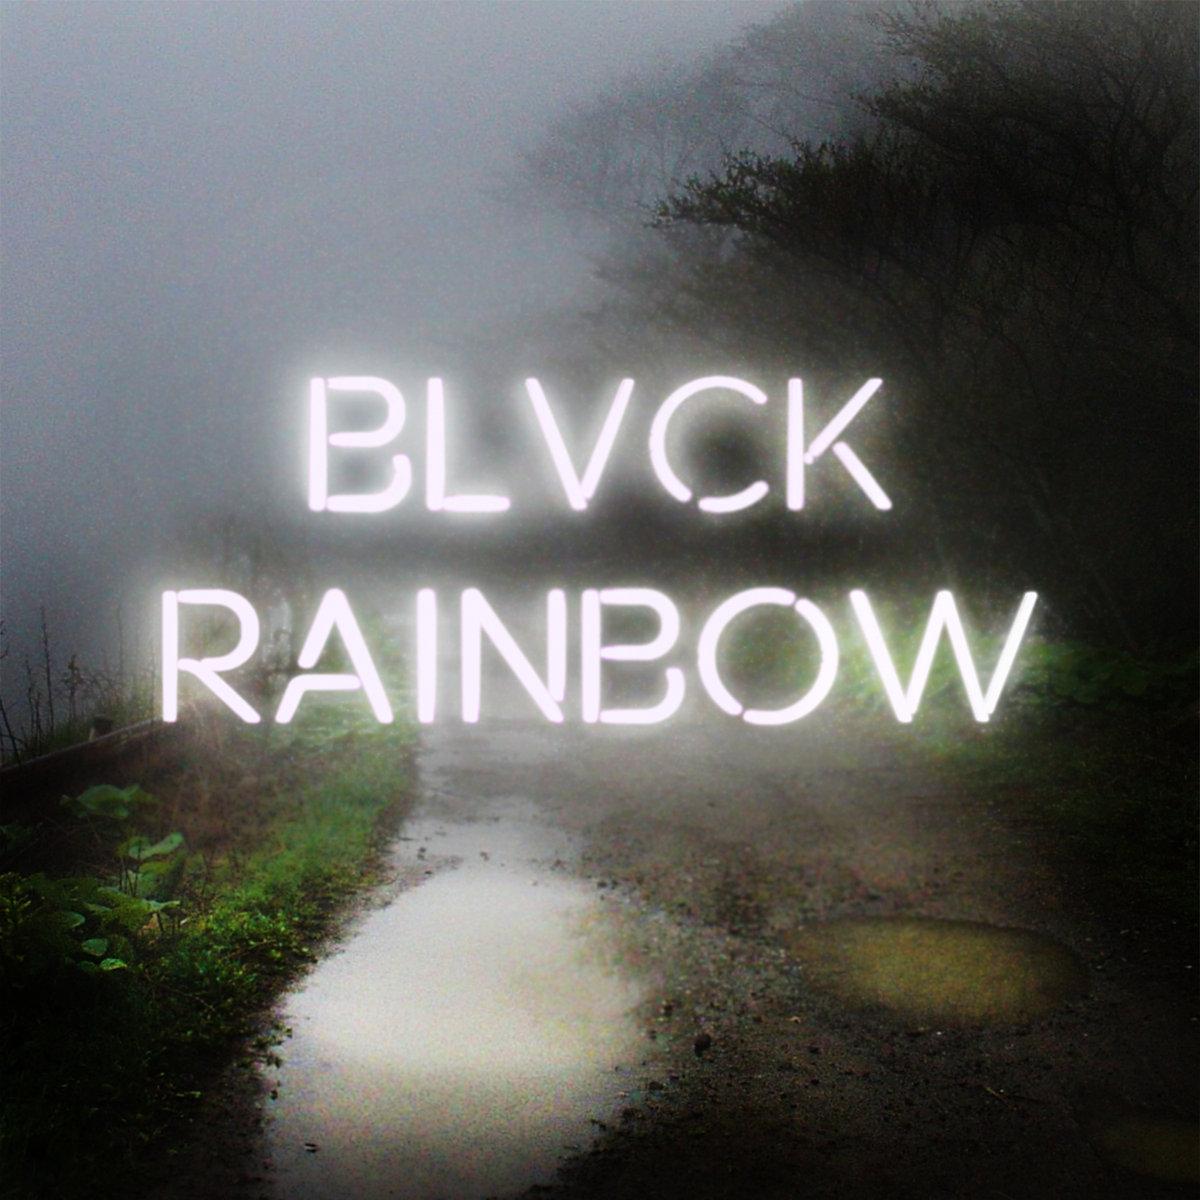 Svgawa & Arelice - Black Rainbow